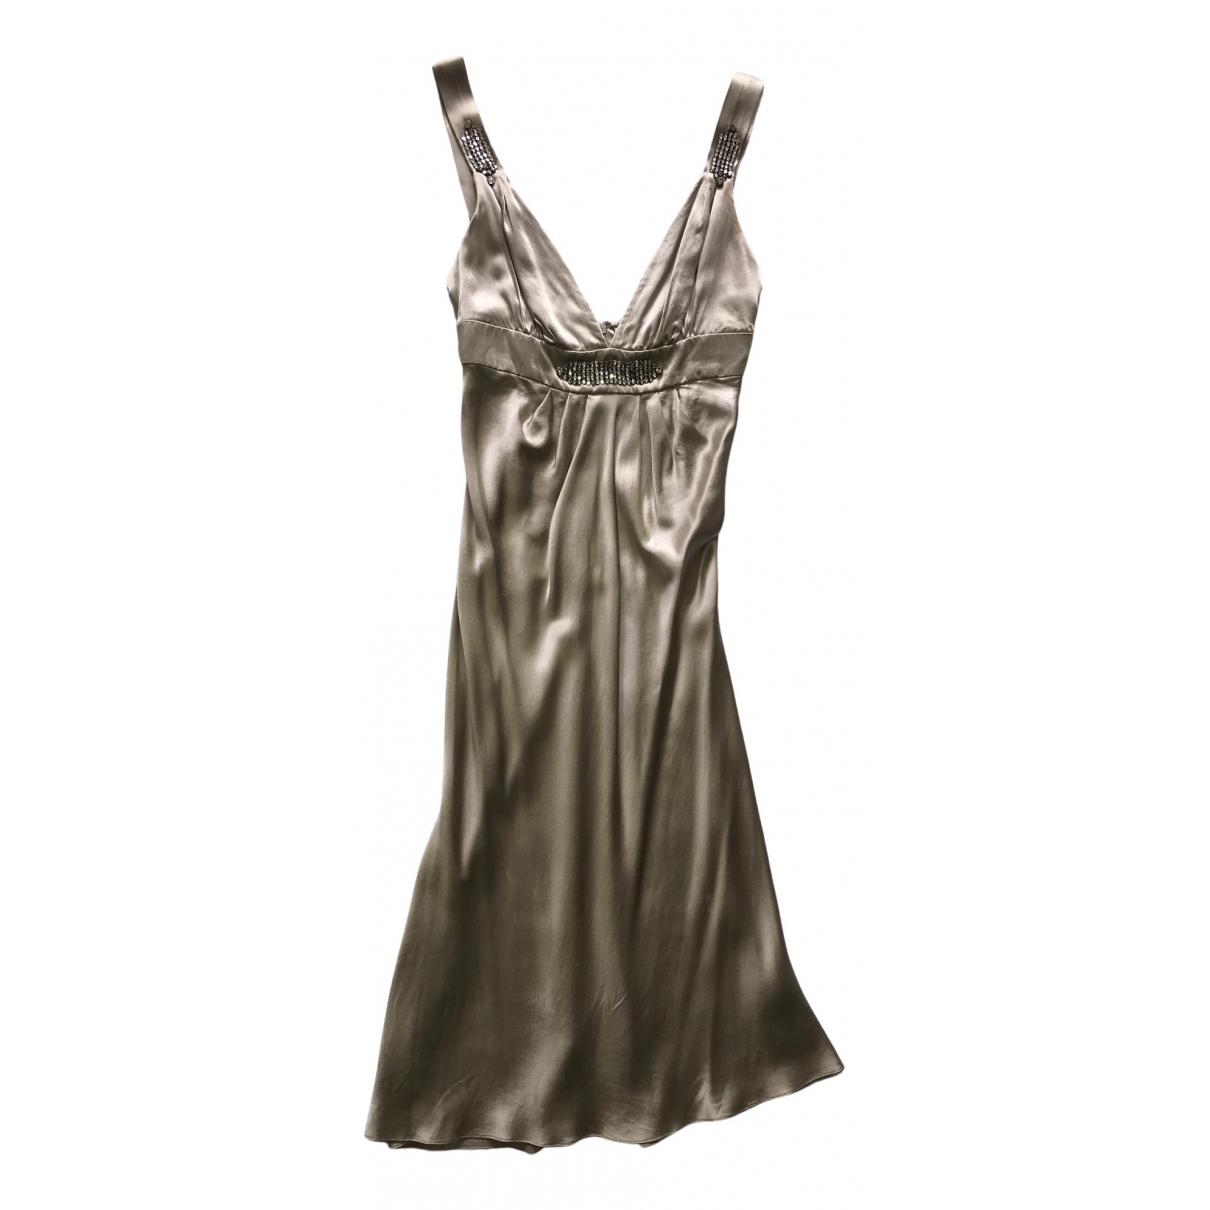 Collette Dinnigan - Robe   pour femme en soie - beige